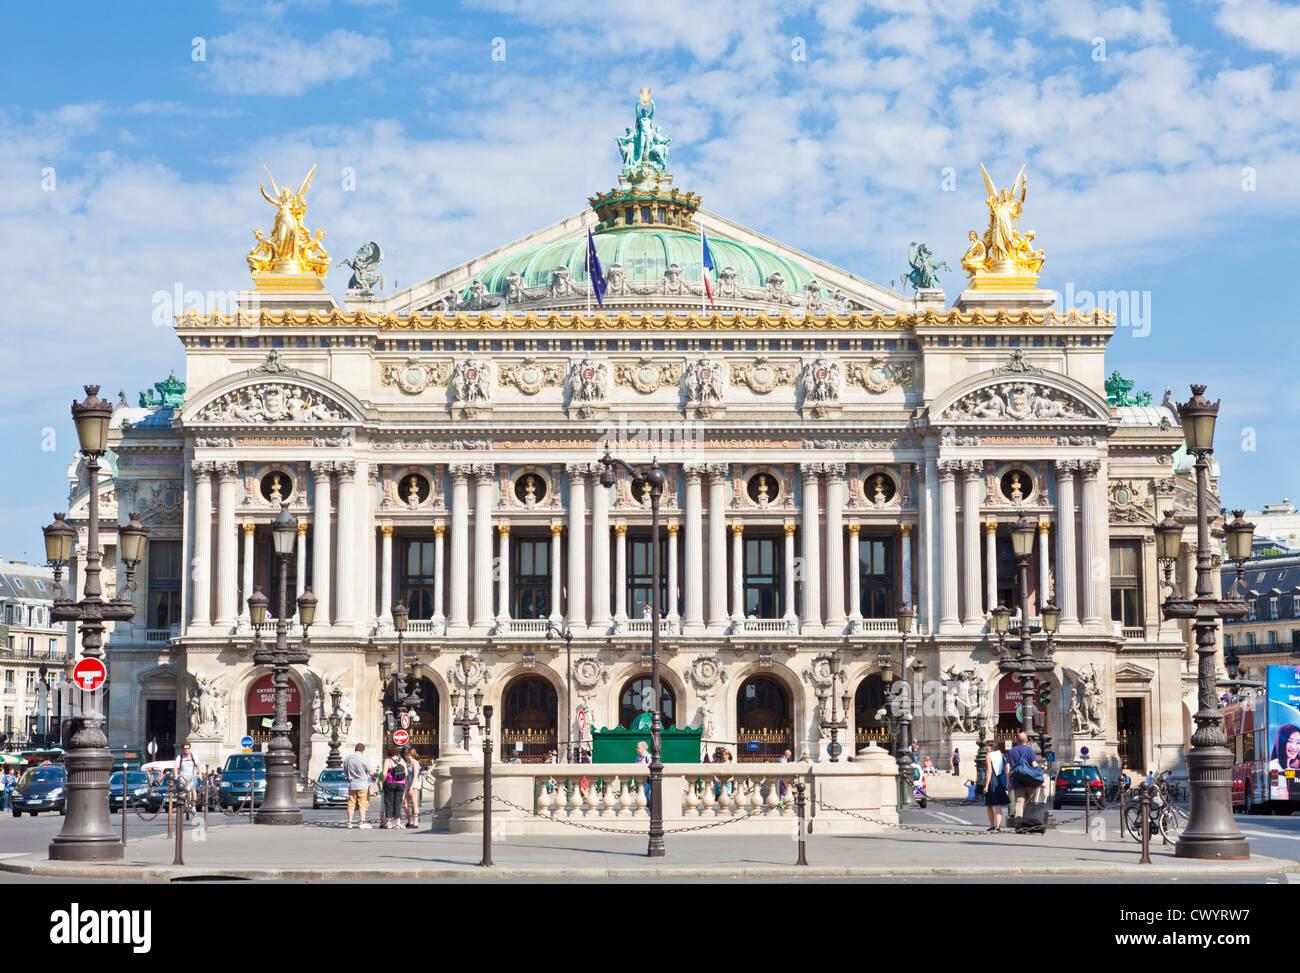 opera garnier place de l 39 opera paris france europe stock photo royalty free image 50398579. Black Bedroom Furniture Sets. Home Design Ideas